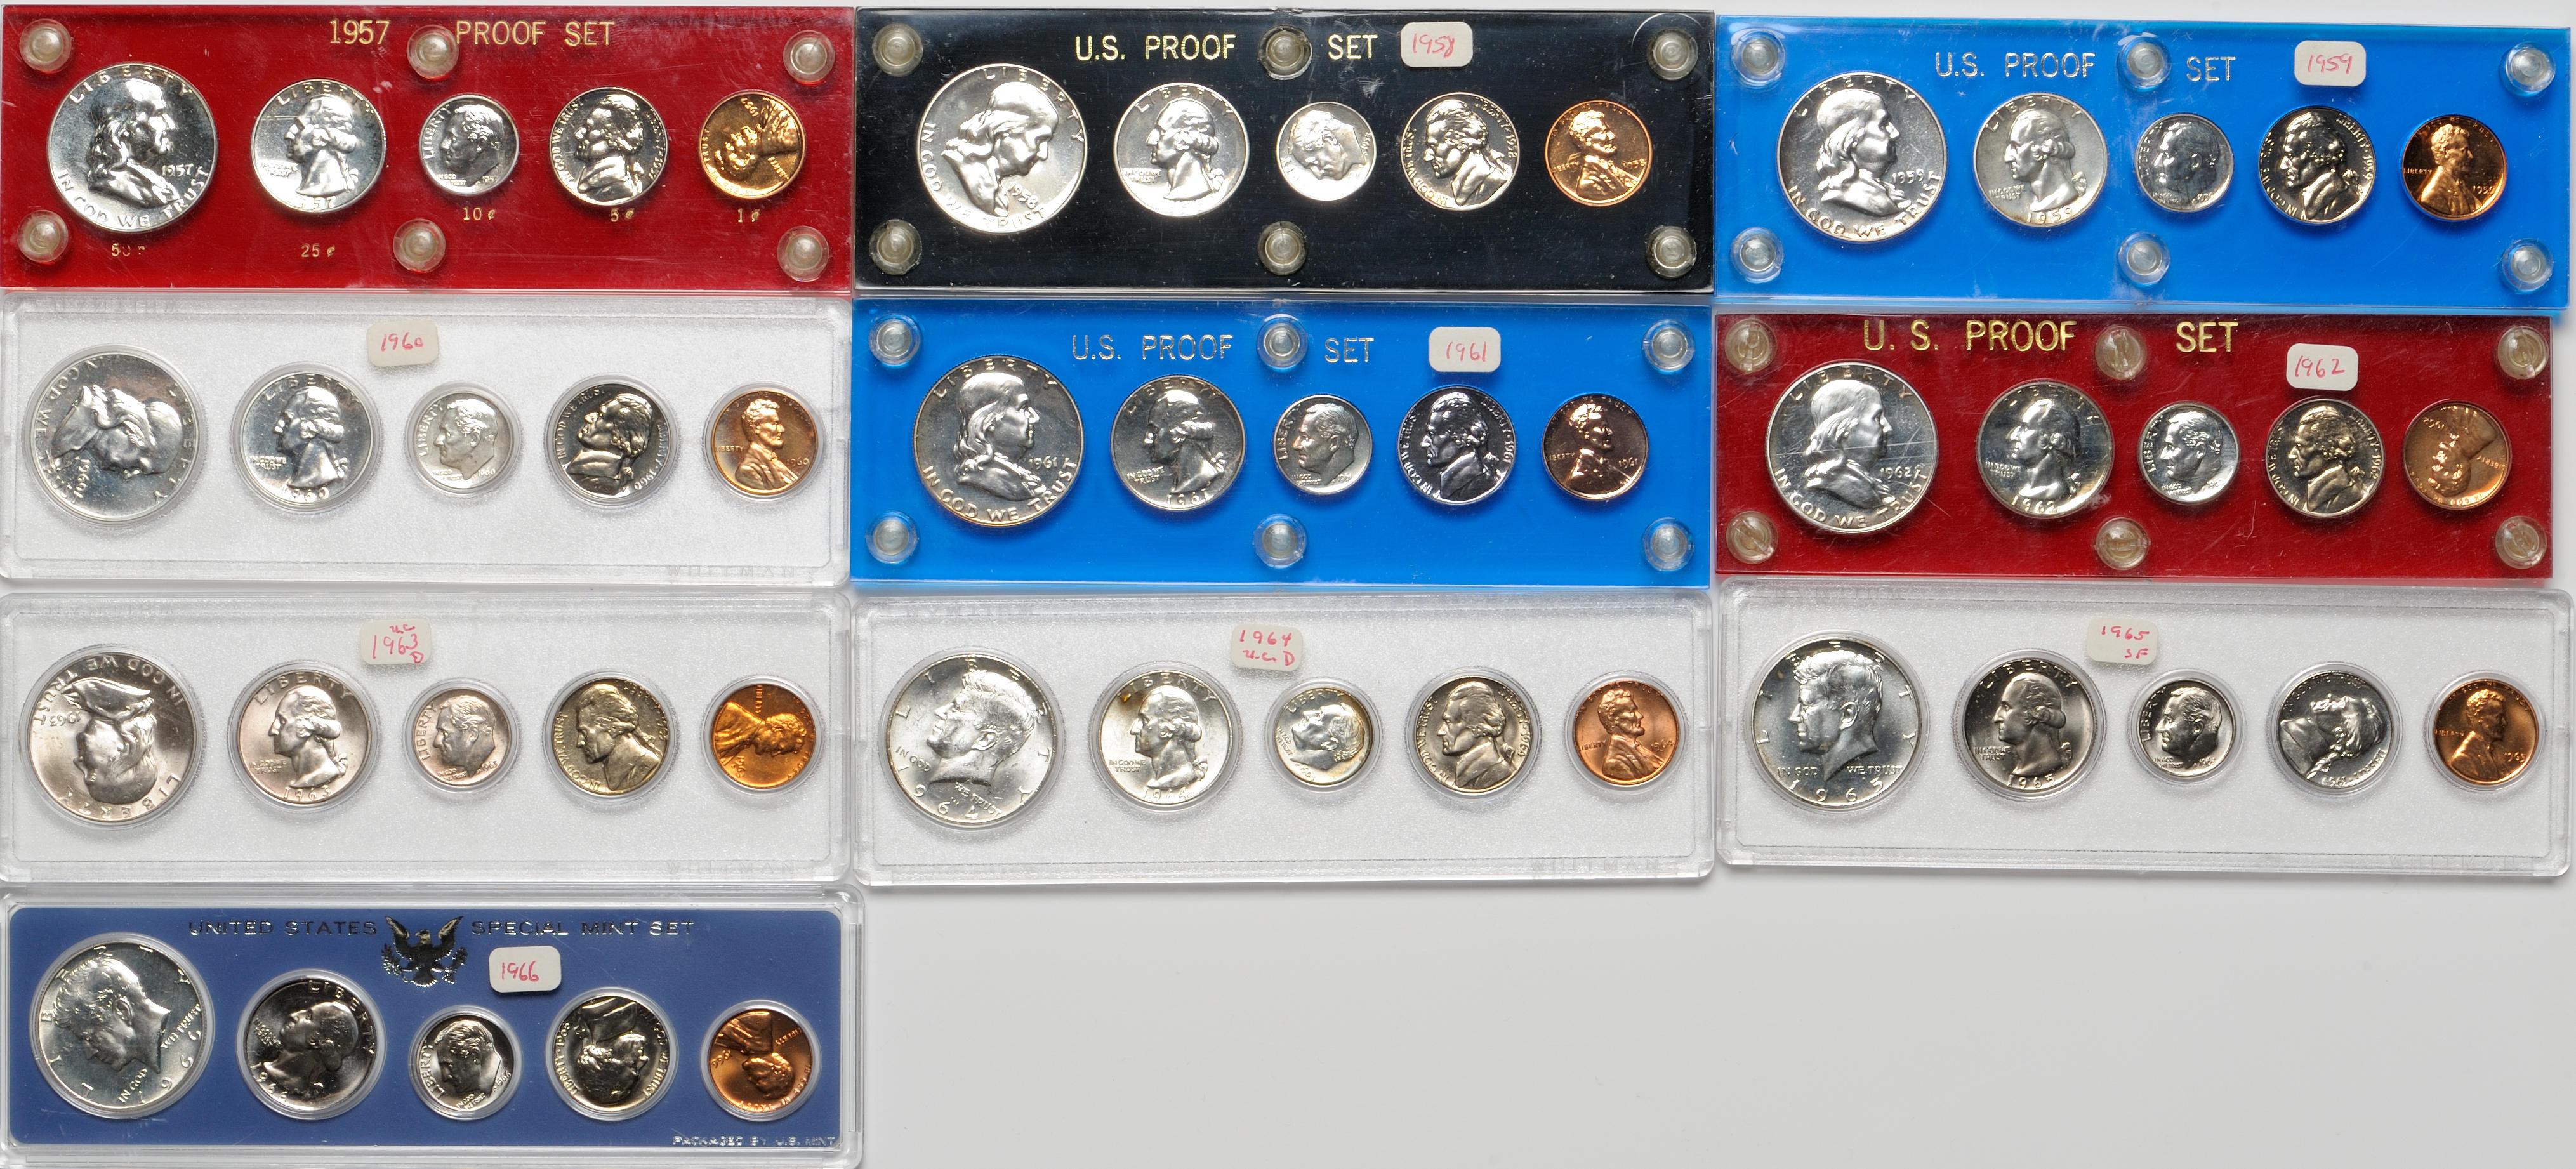 Capital Plastic Holder For Eisenhower Dollar Coin Set 1971-1976 S Black Display